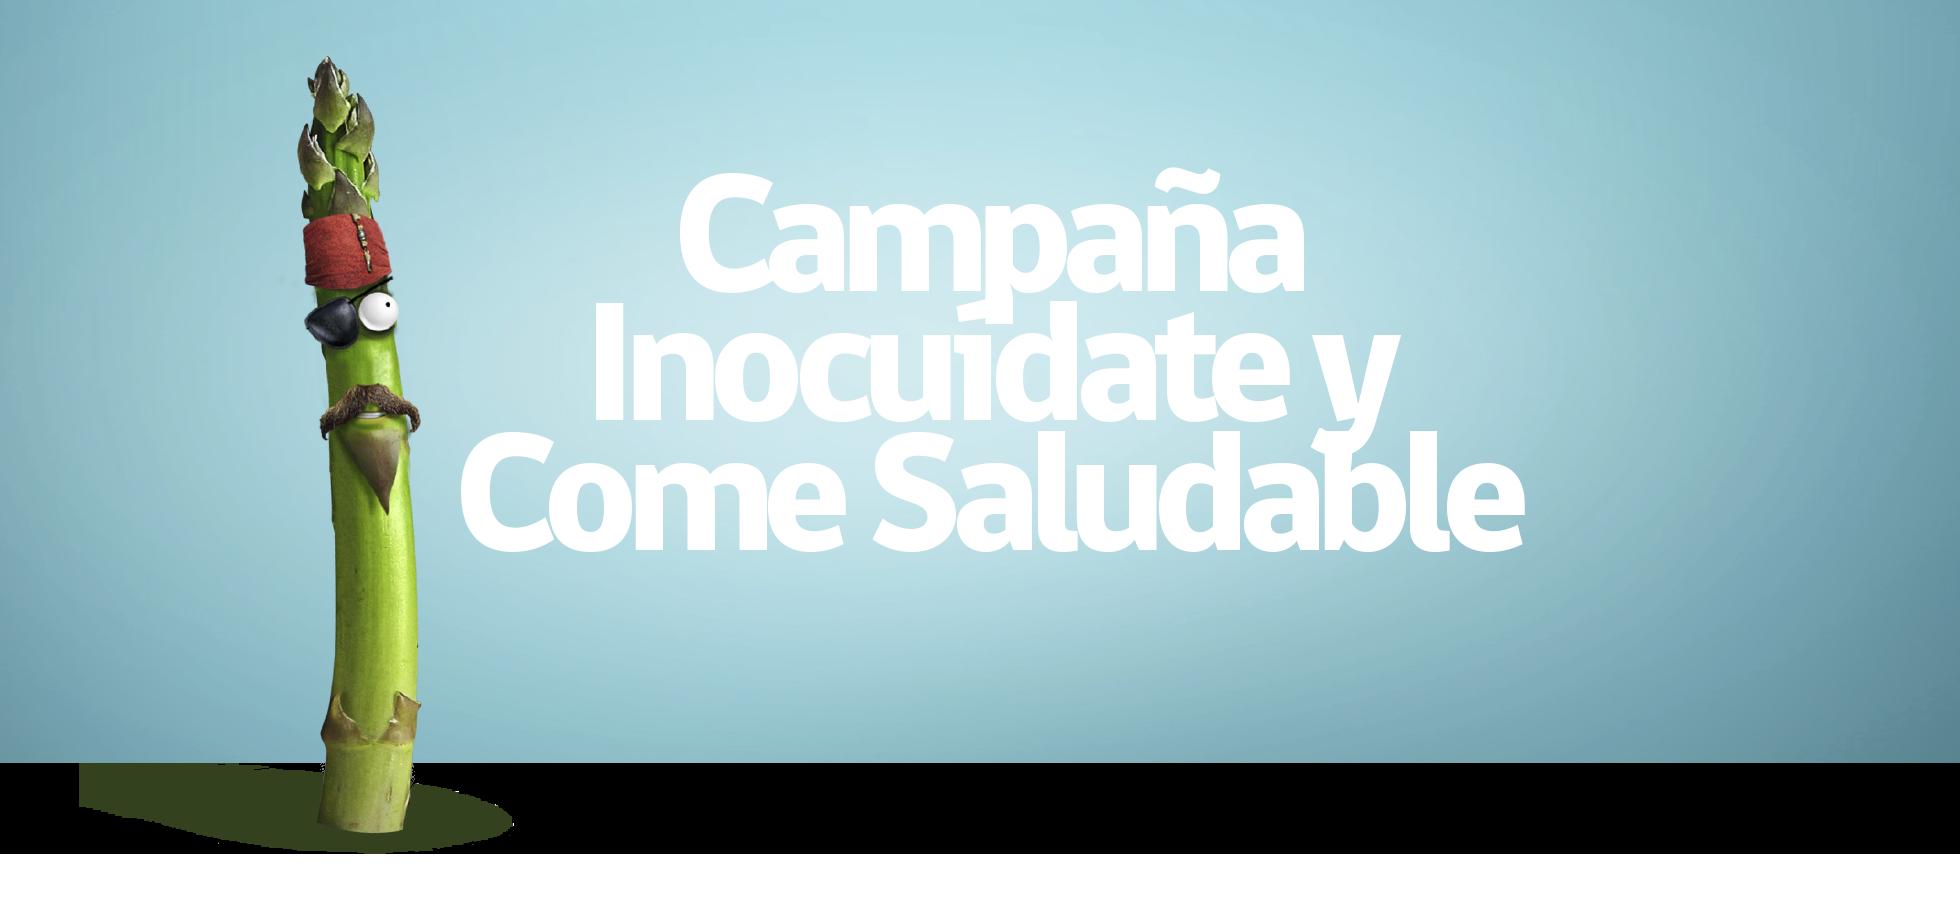 CampañaInocuidate